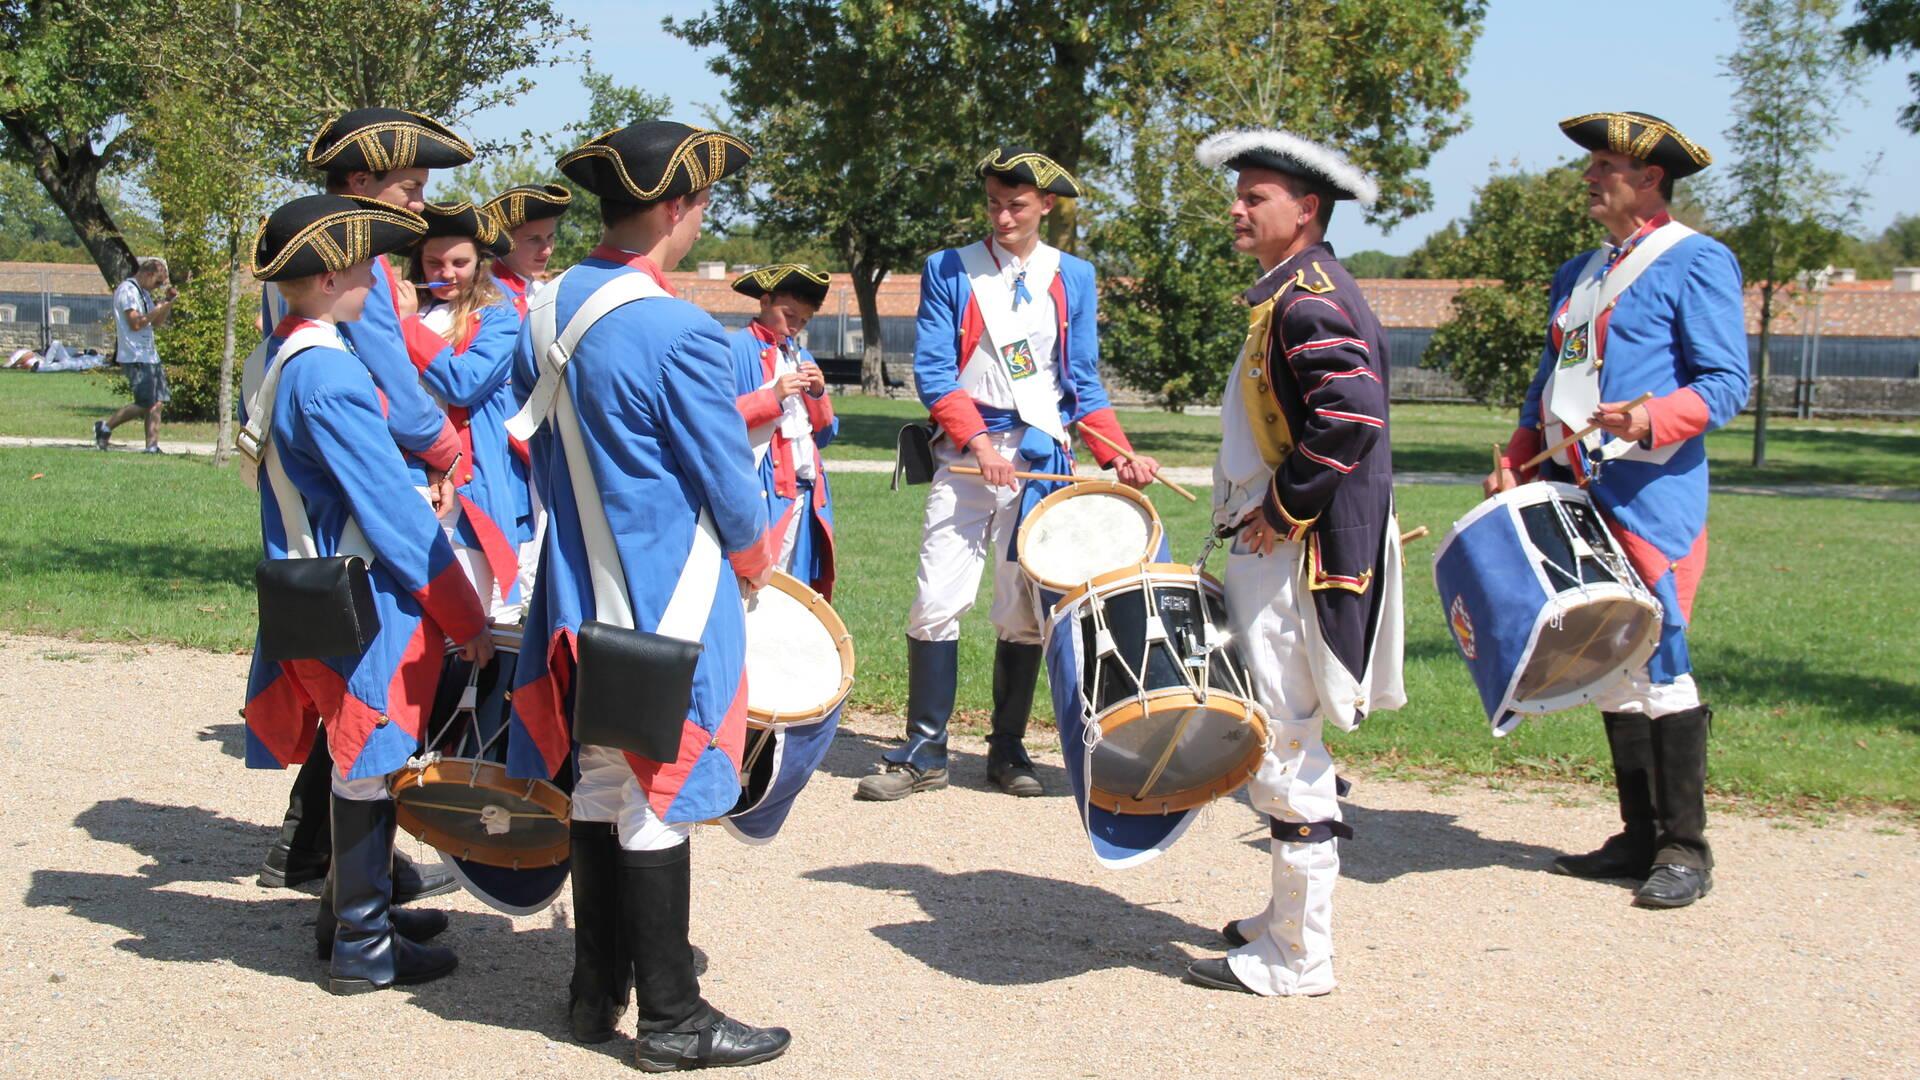 26 et 27 août 2017, Rochefort fête La Fayette © F. Marzo Office de Tourisme Rochefort Océan